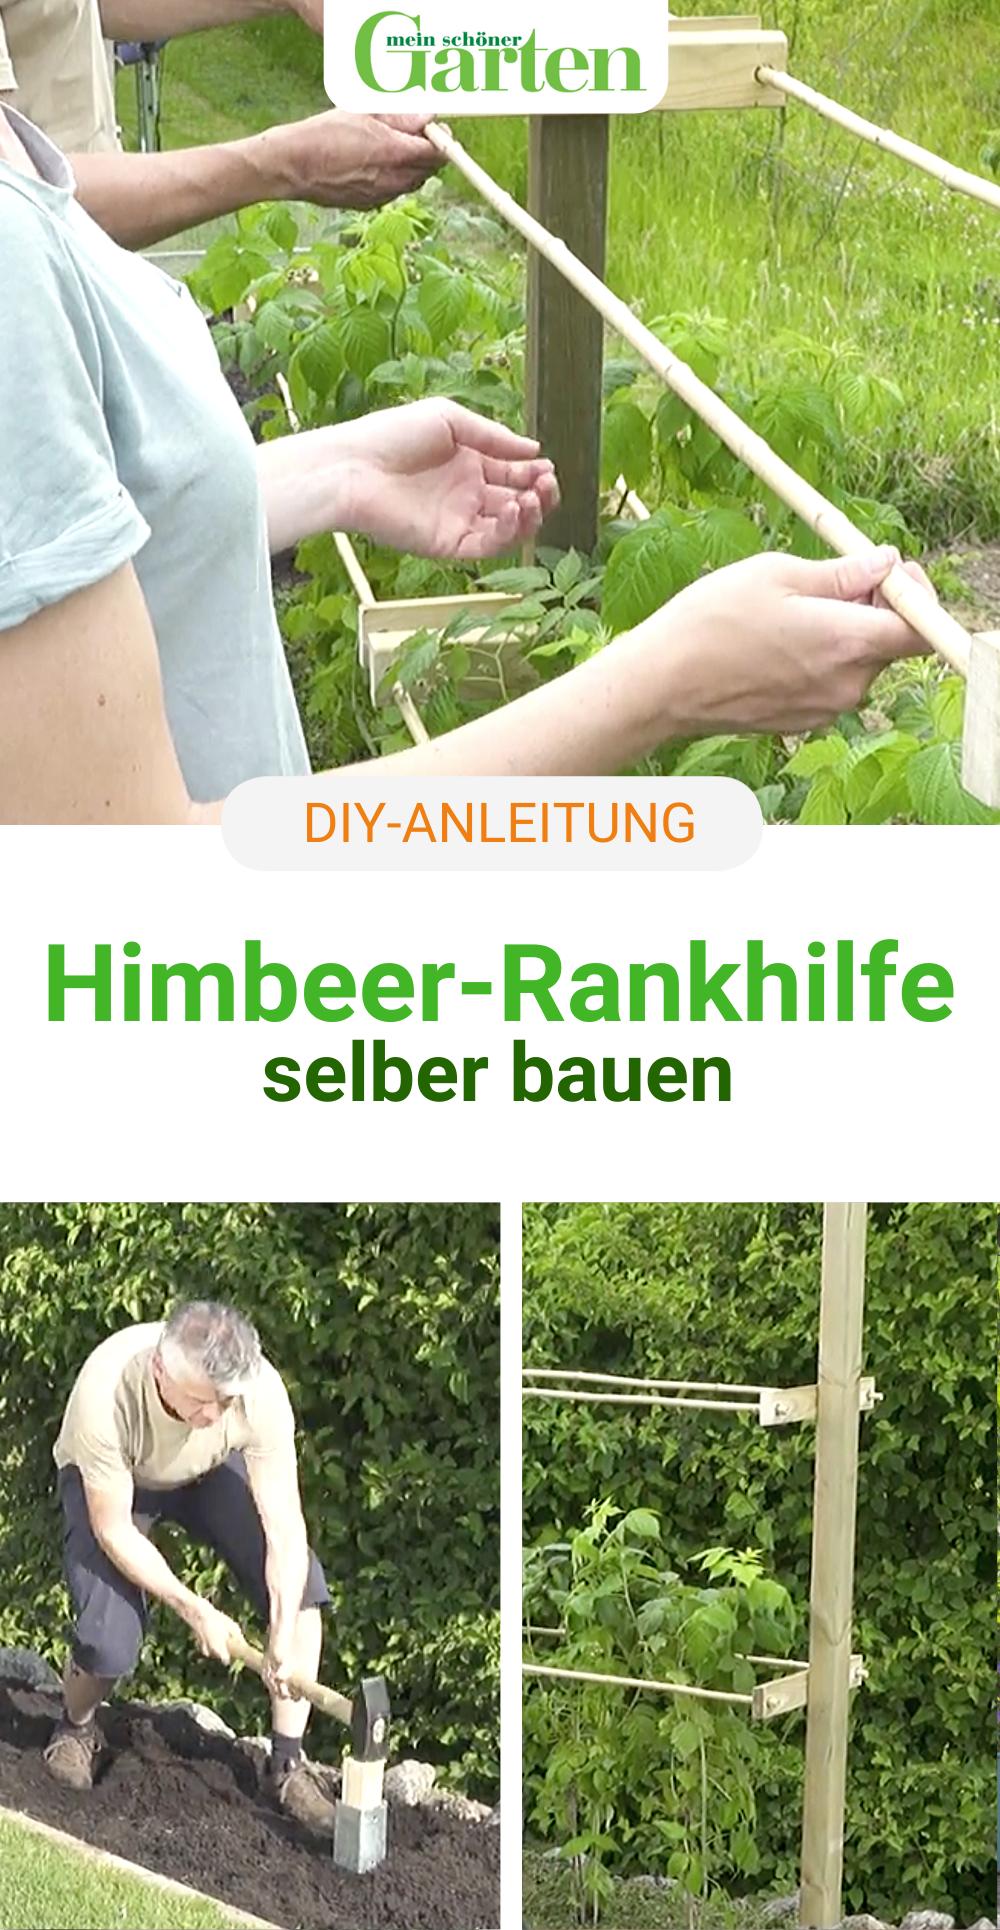 DIY: Himbeerspalier selber bauen